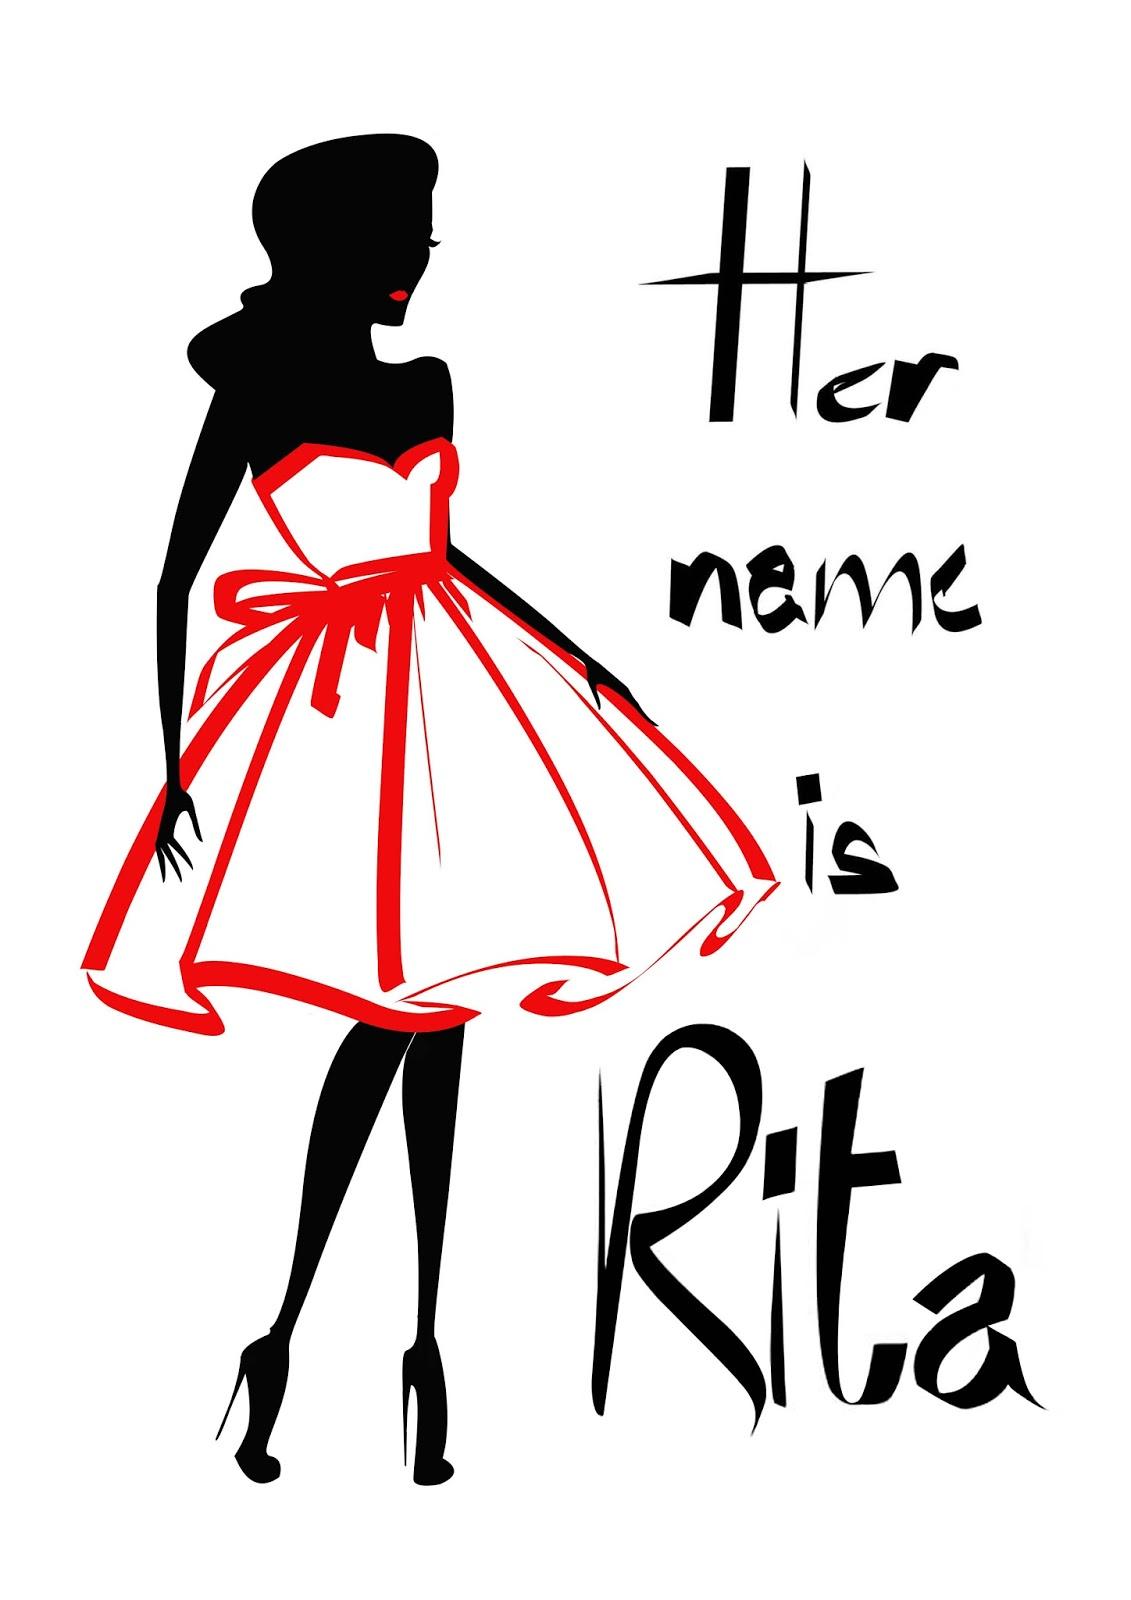 I l l u s t r a l e x septembre 2013 - Vente a domicile pret a porter femme ...